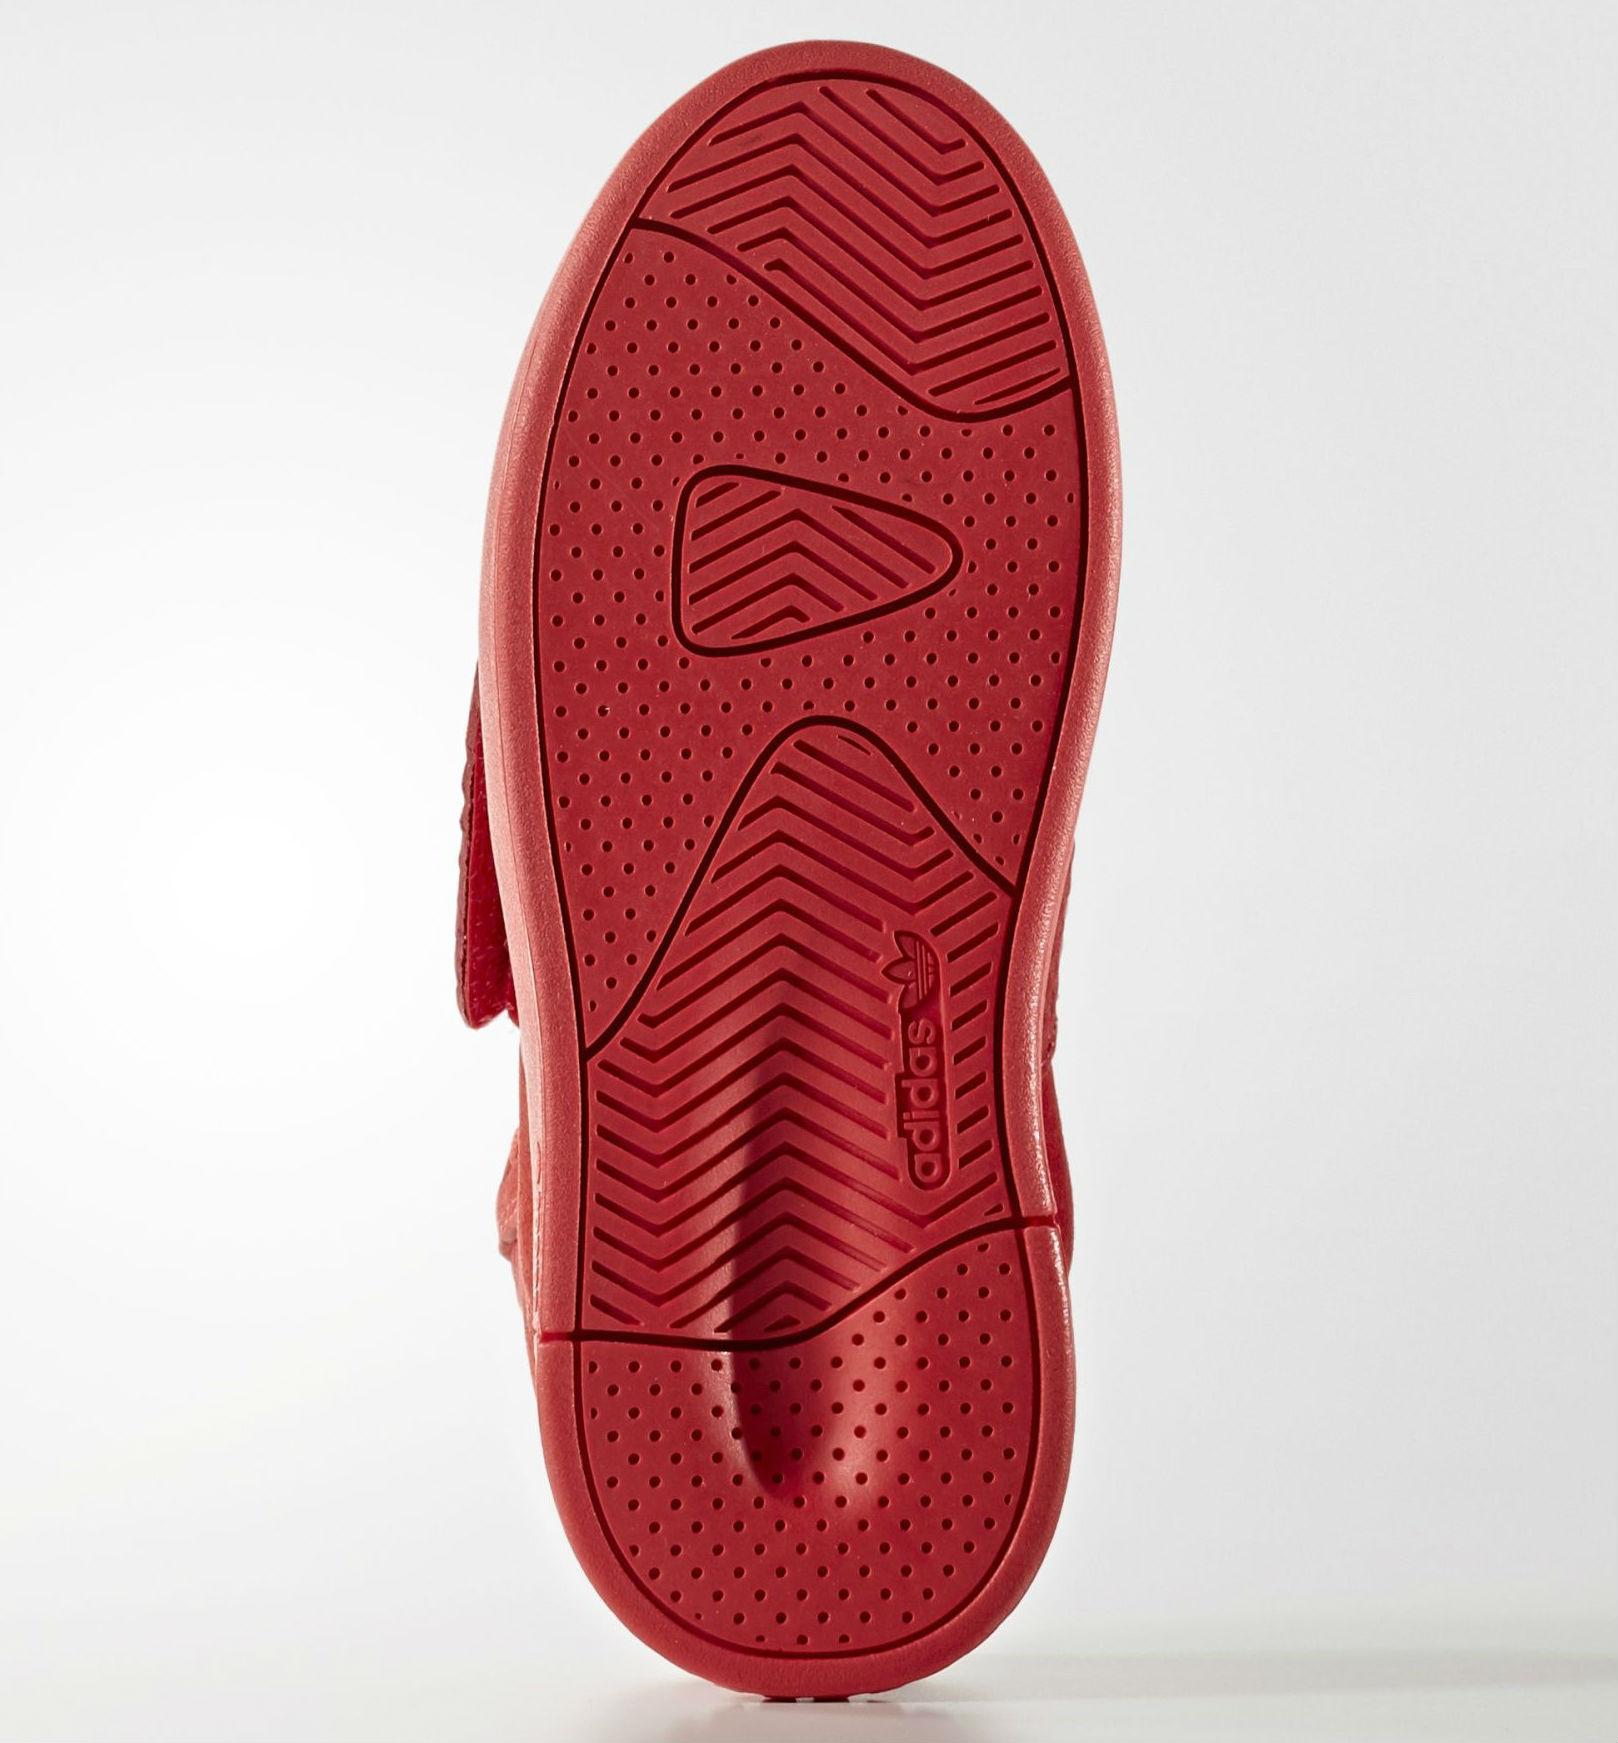 adidas Tubular Invader Red October Sole